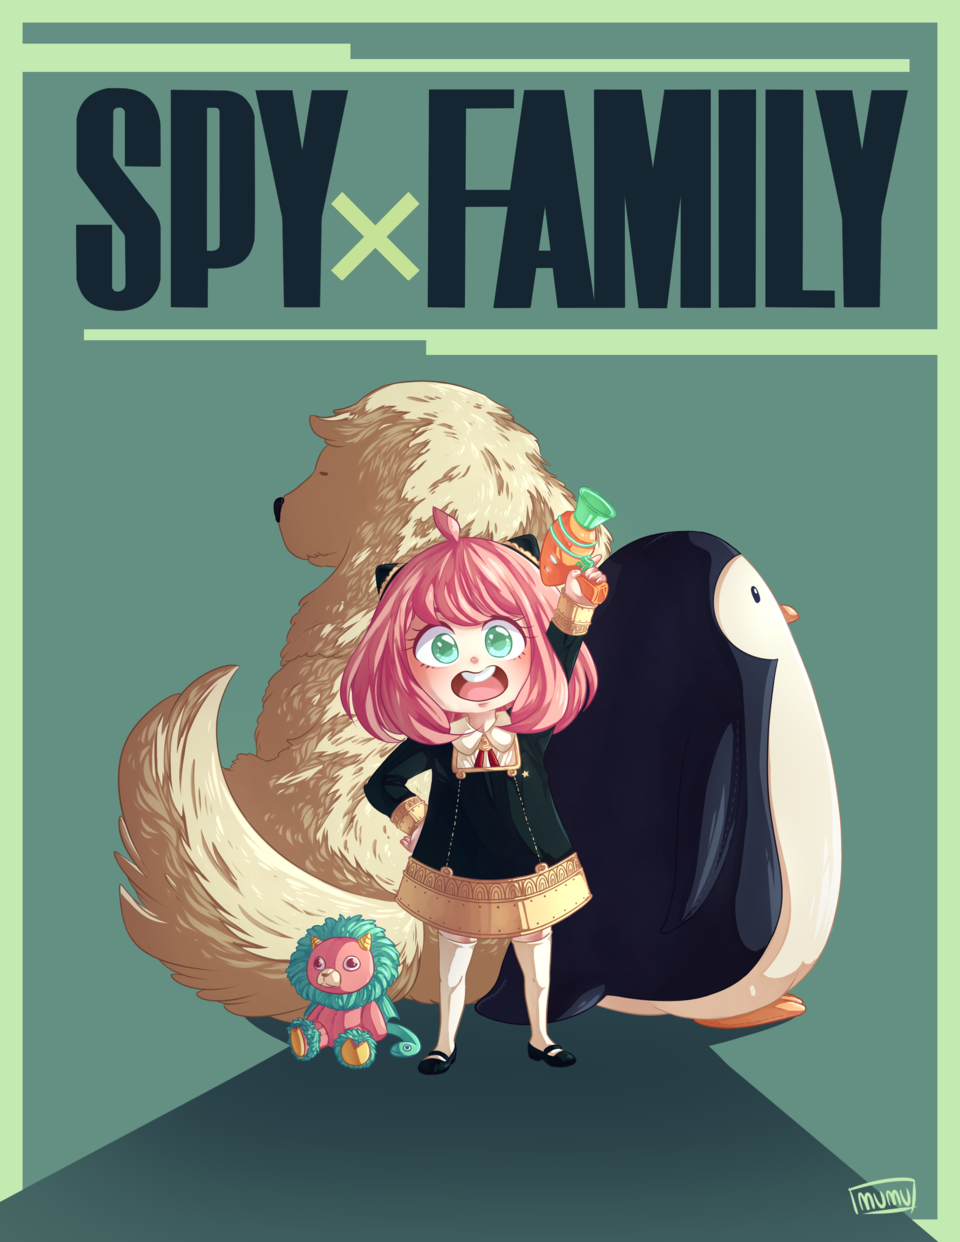 SPYXFAMILY CONTEST Illust of MUMU SPY×FAMILY_Contest digital fanart SPY×FAMILY pinguin anya dog spyxfamilyart chimera